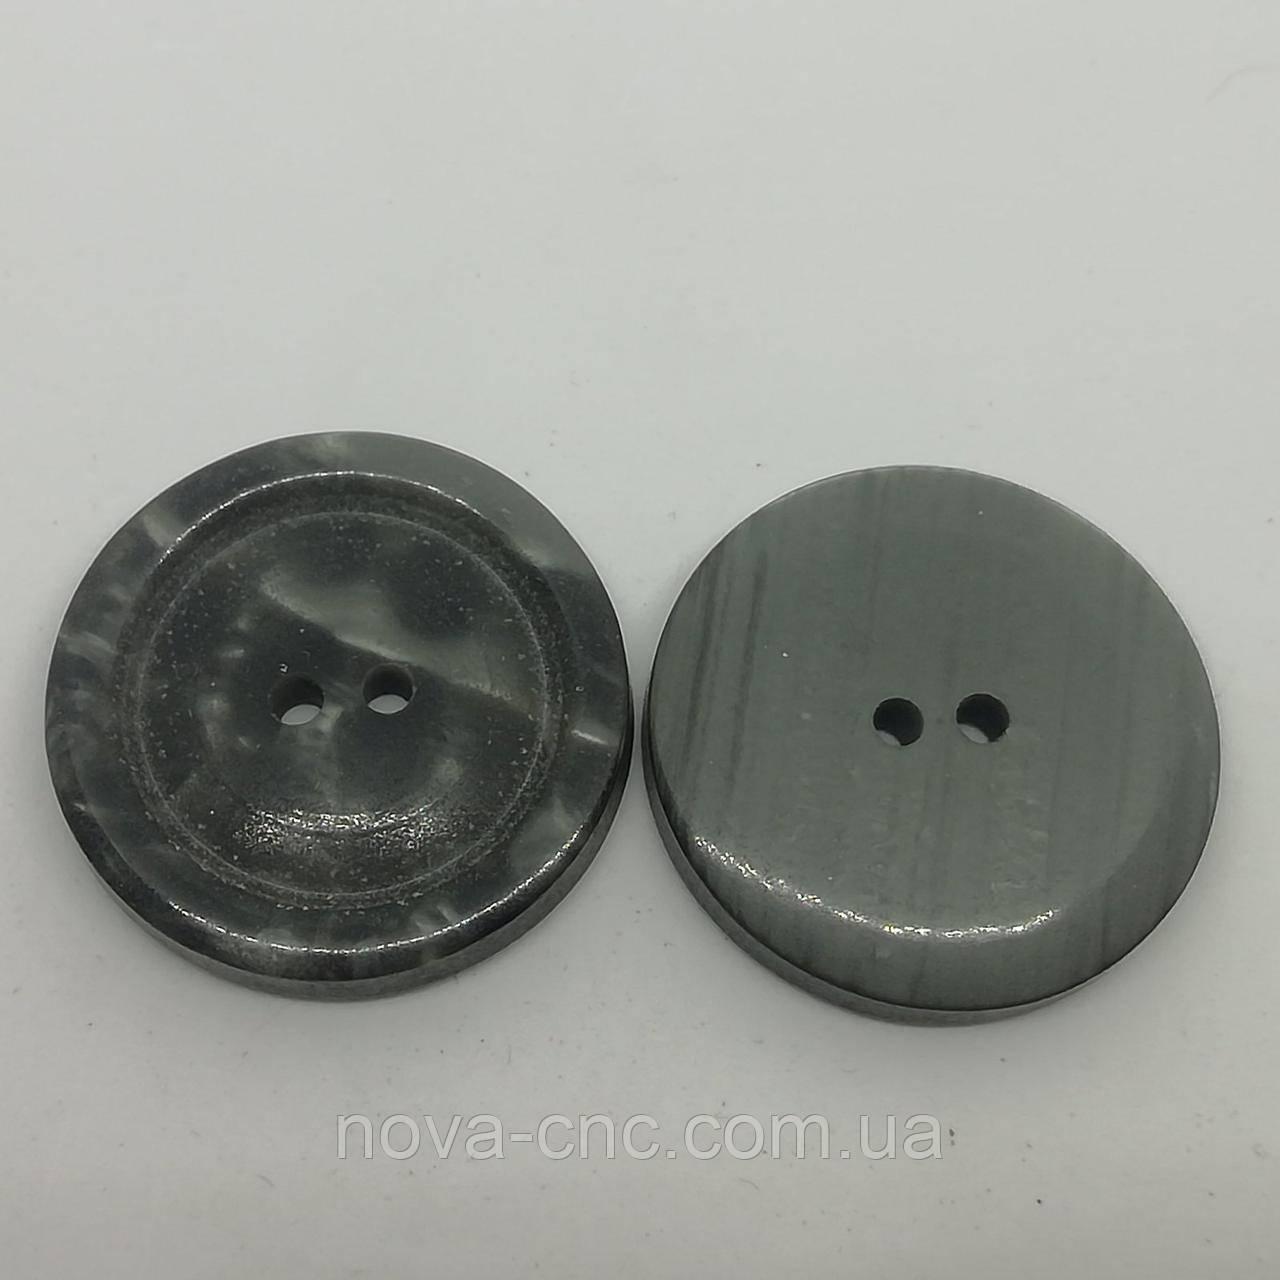 Пуговица пластмассовая 28 мм Цвет серый Упаковка 420 штук